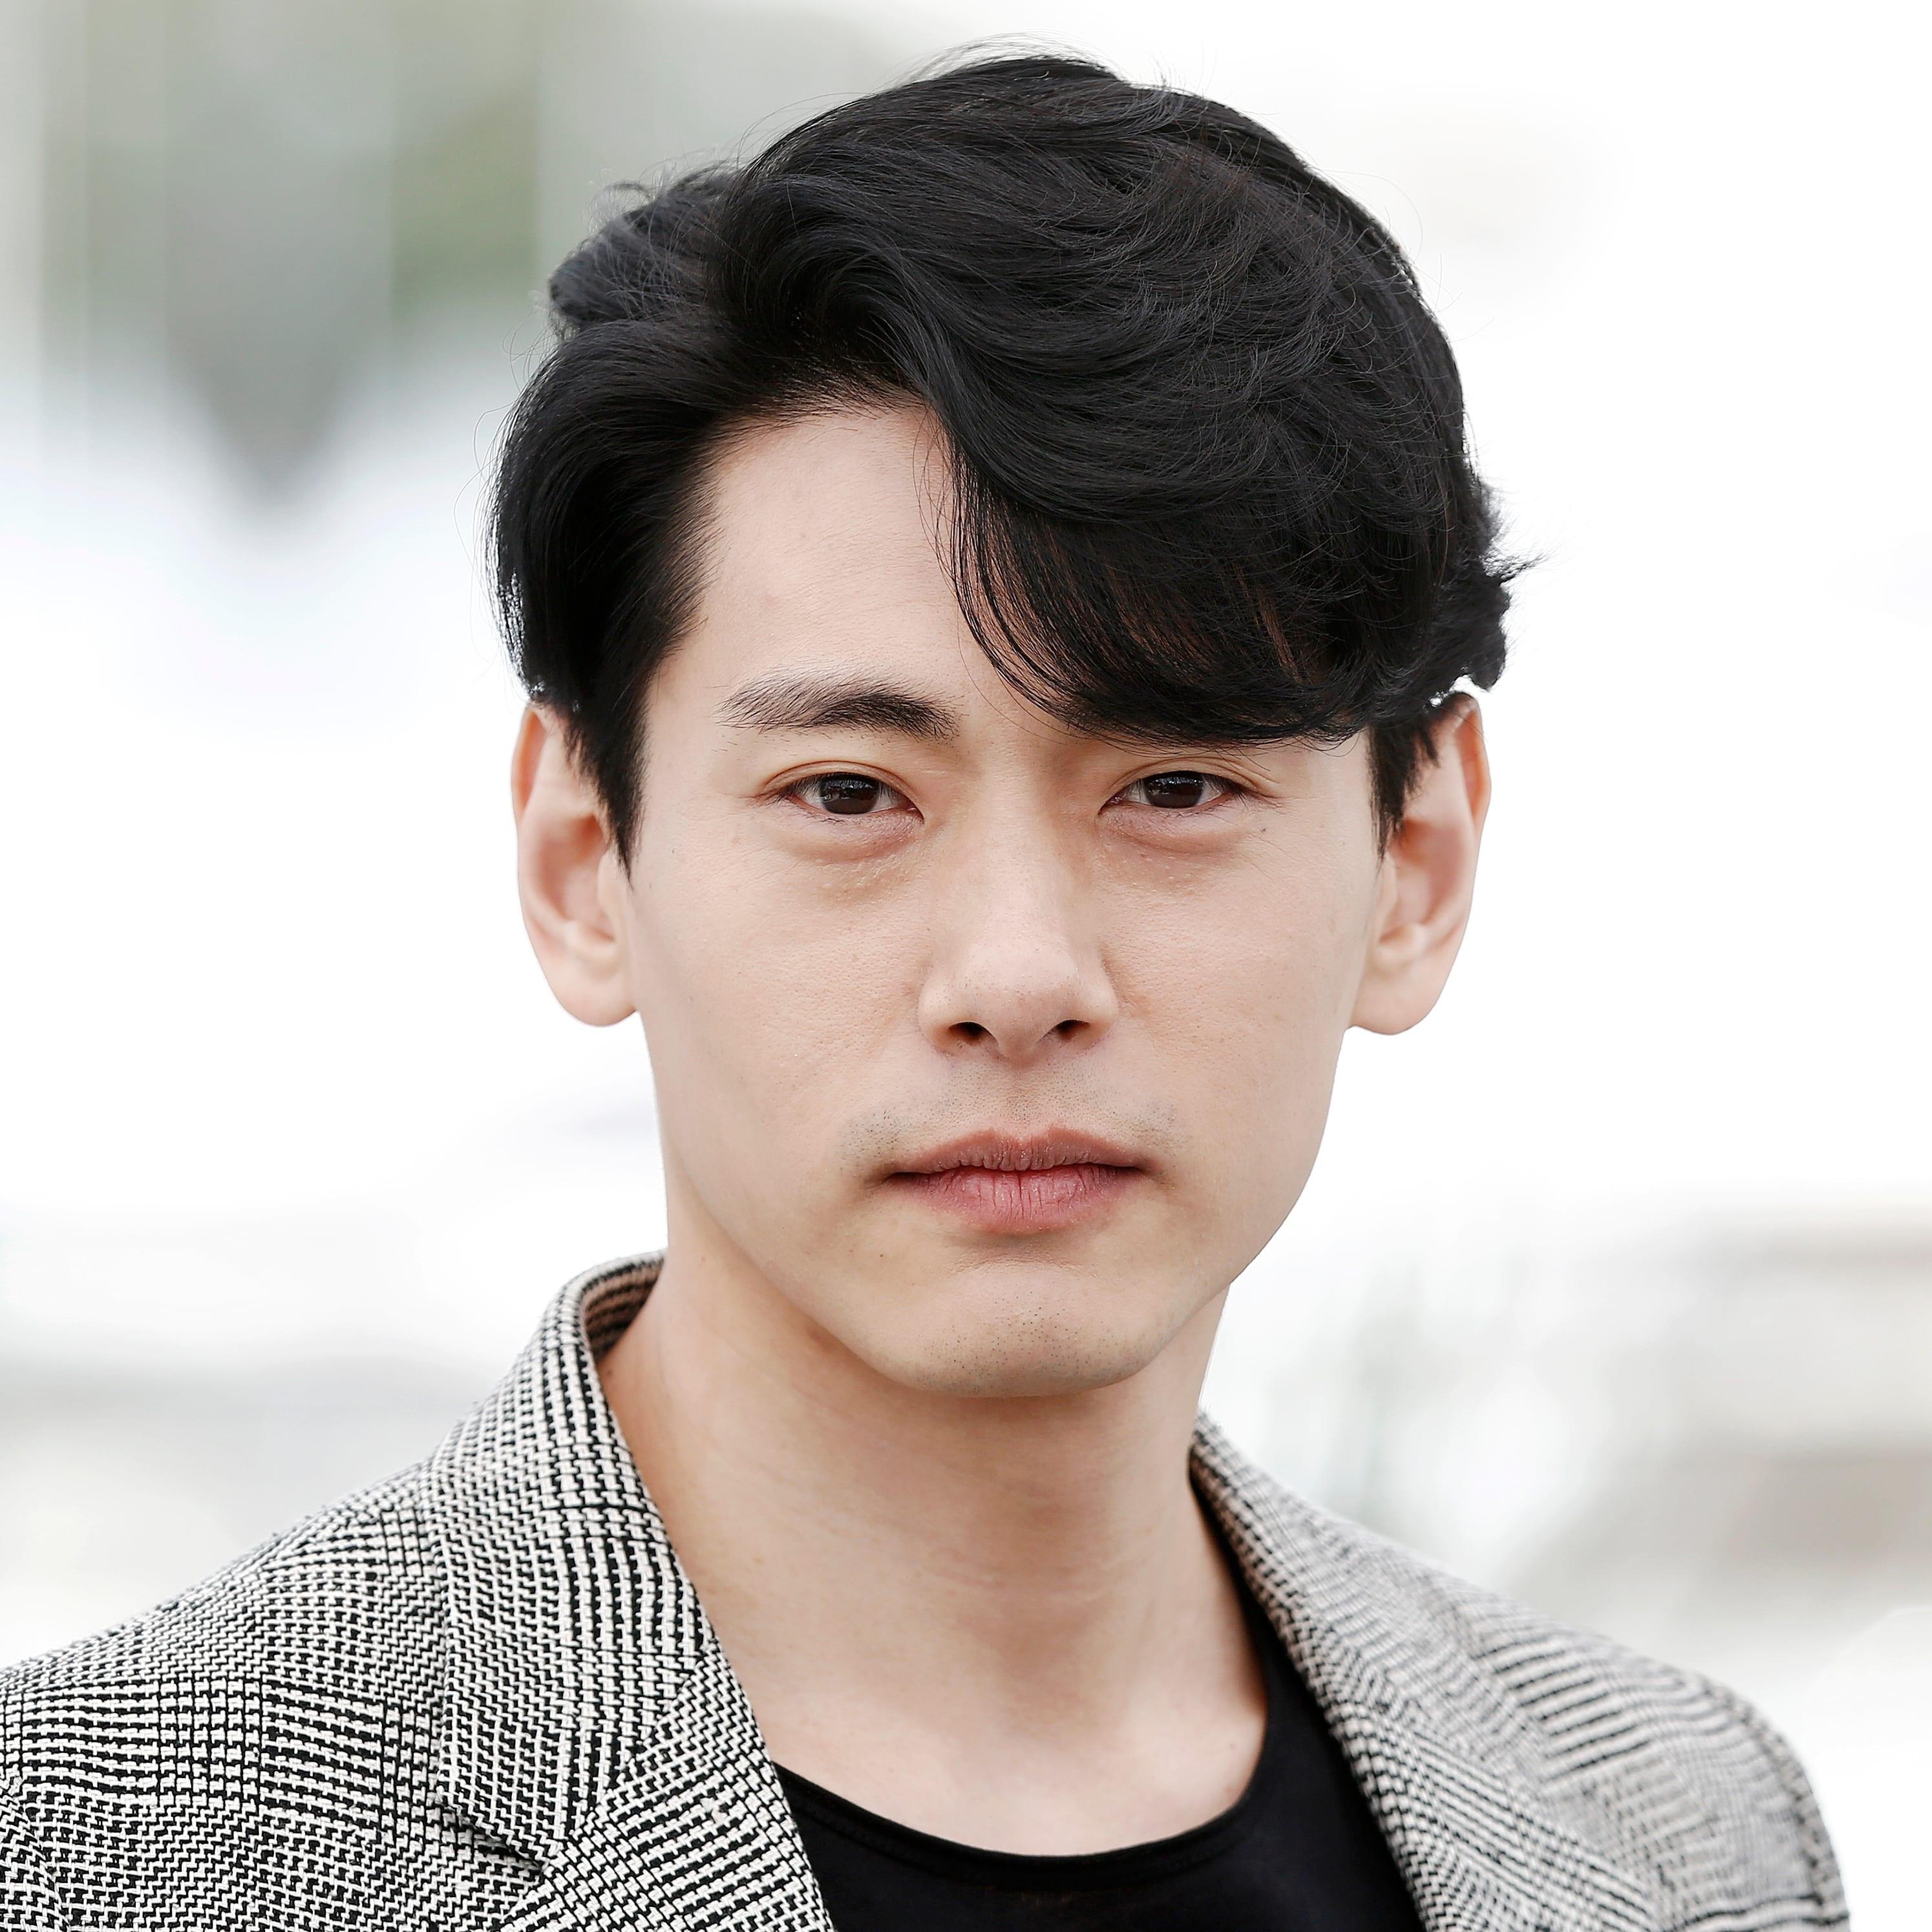 Top 30 Trendy Asian Men Hairstyles 2019 regarding The best Asian Hairstyles 2019 Male